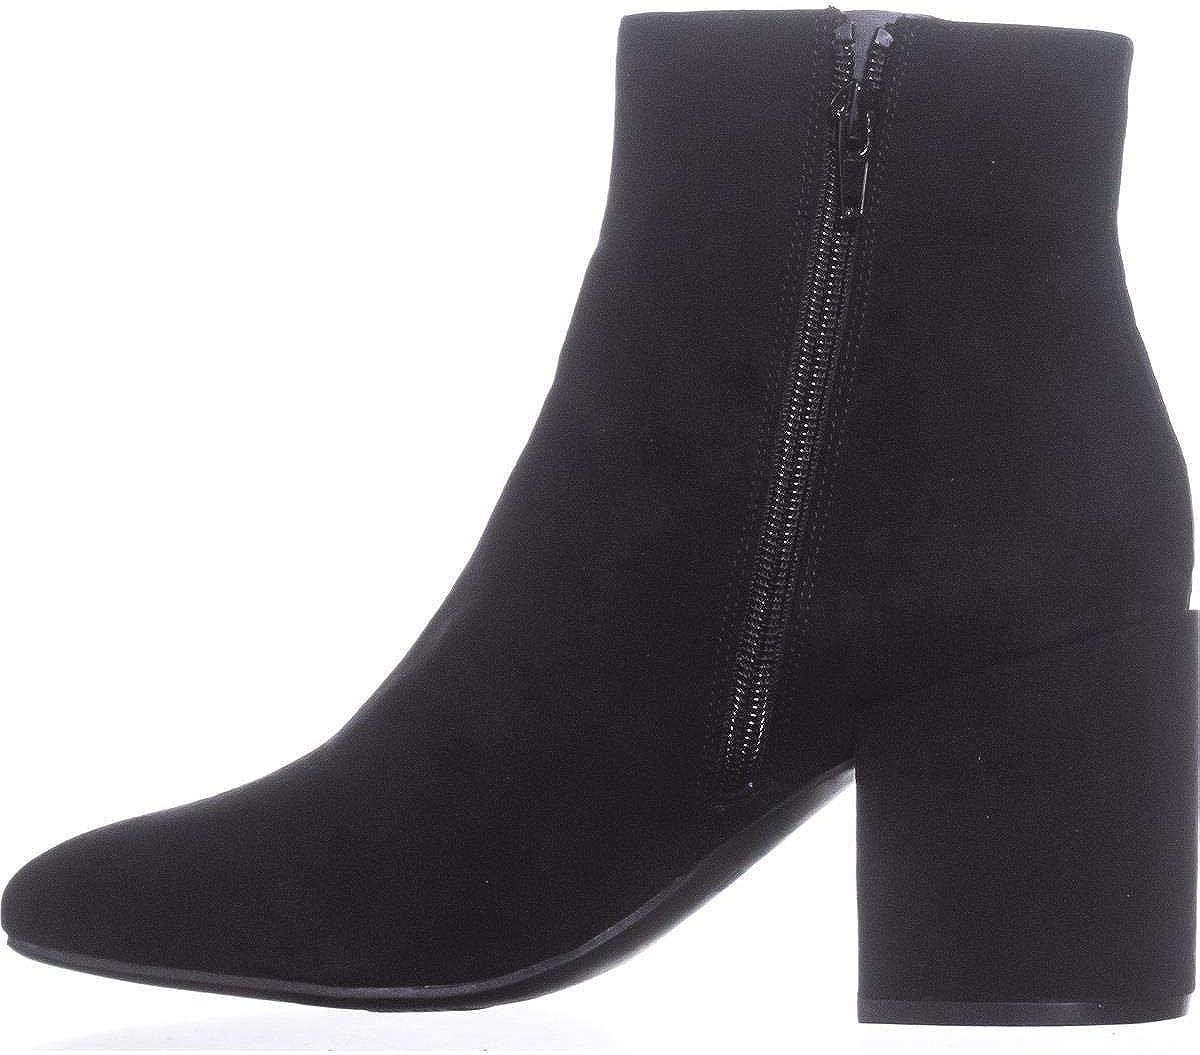 Bar III Womens Gatlin Fabric Closed Toe Ankle Fashion Boots Size 11.0 Black